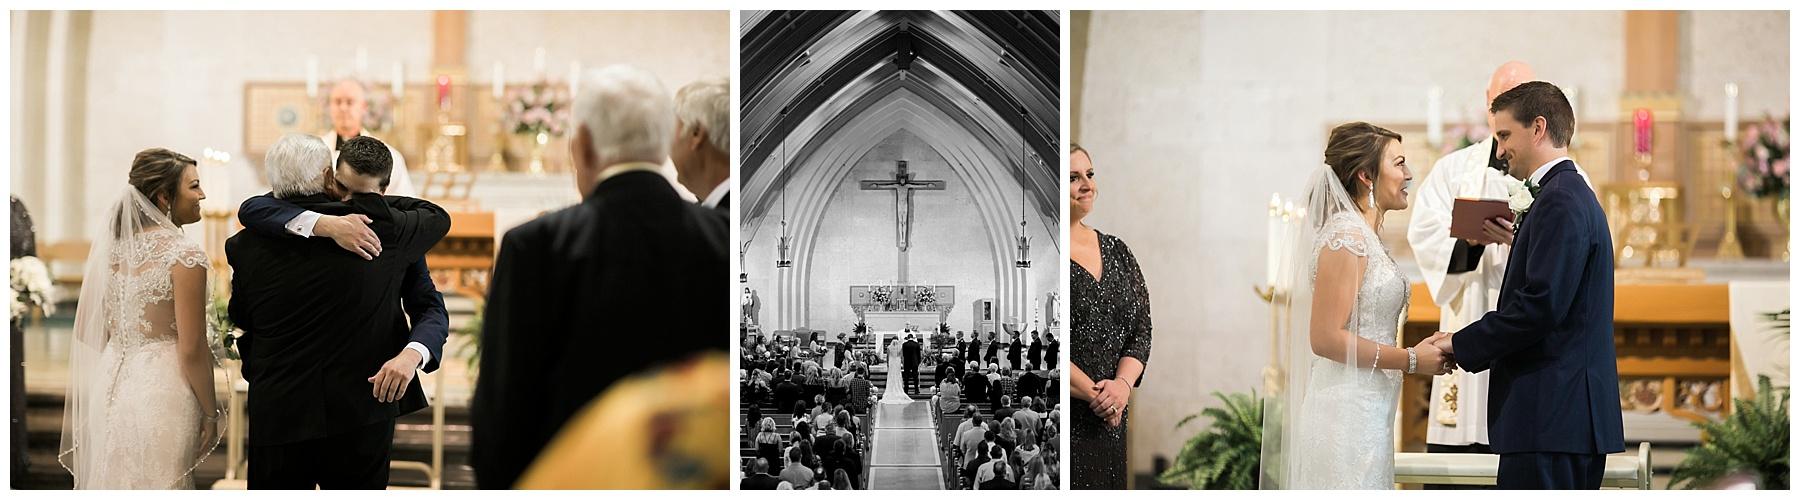 sacred-heart-catholic-church-muenster-tx-the-veranda-in-nocona-tx-wichita-falls-wedding-photographer-00015.jpg